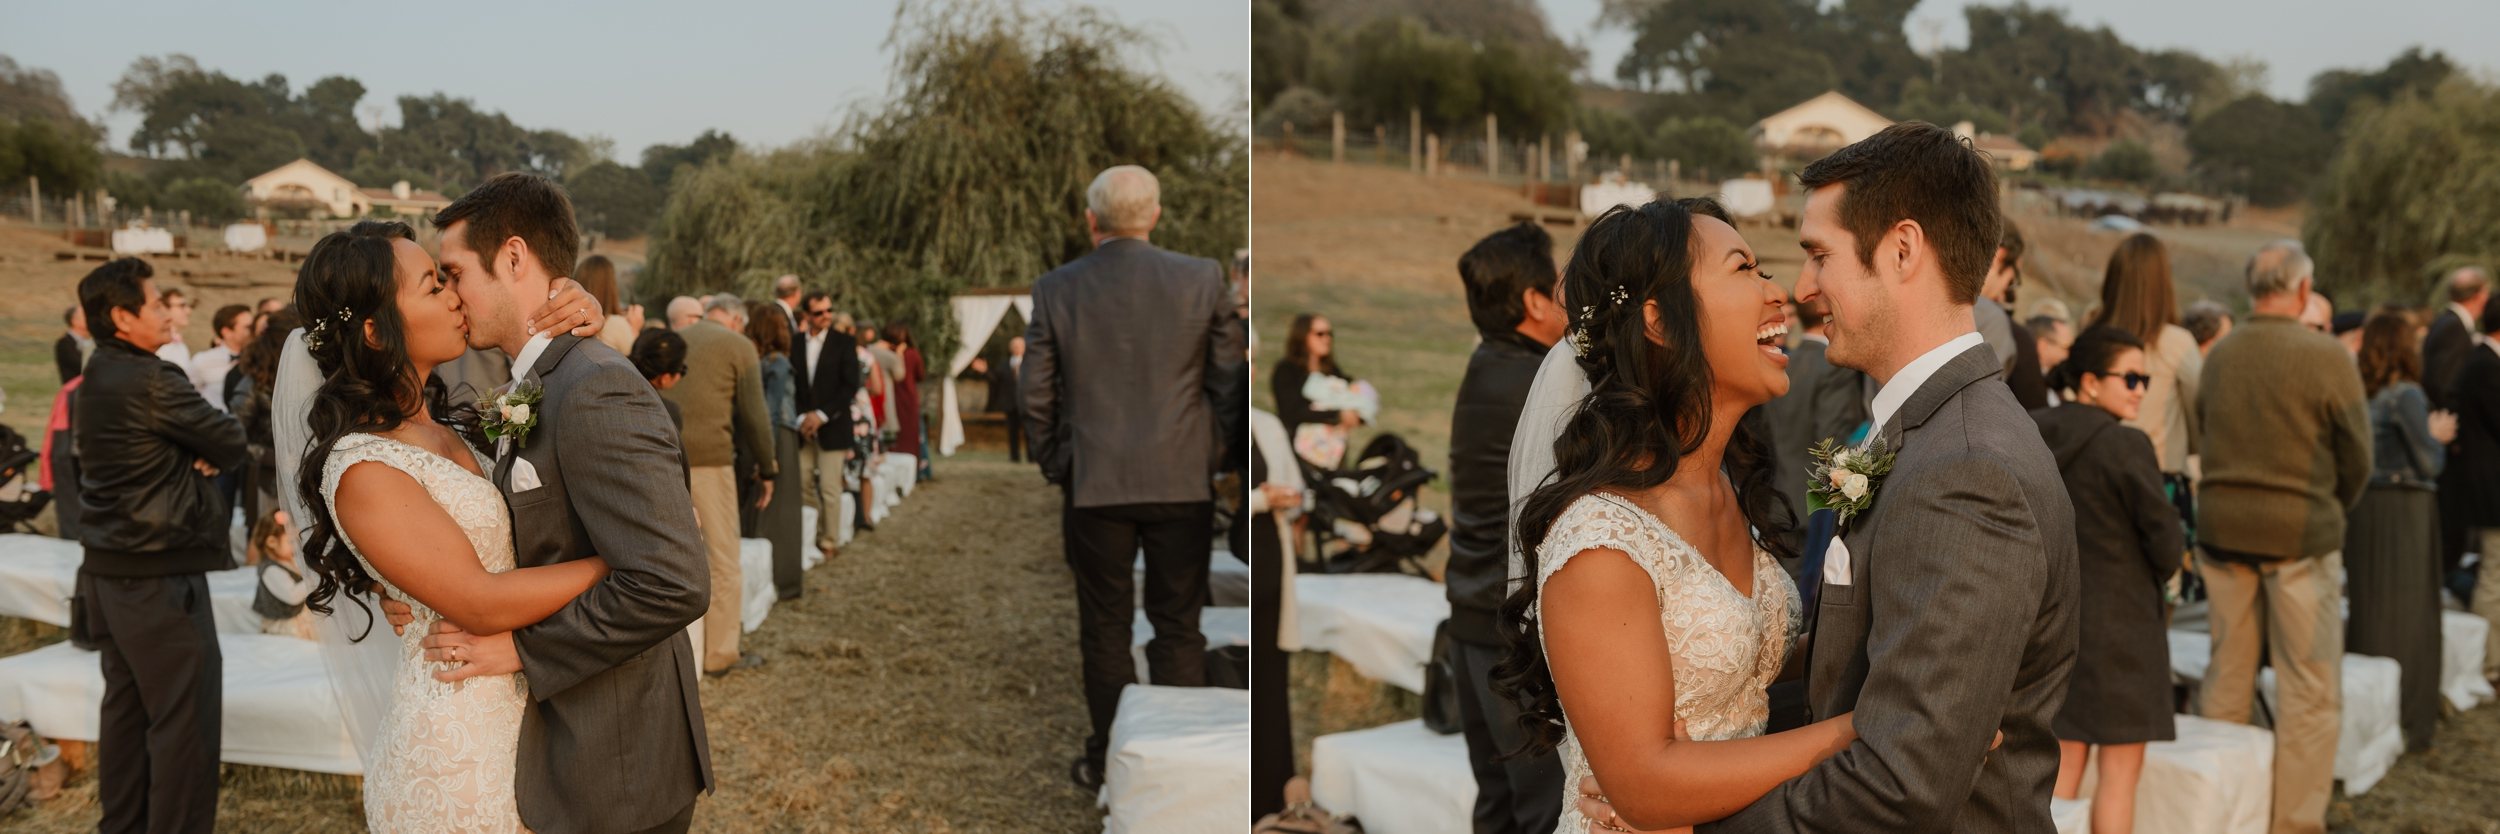 056marin-petaluma-backyard-wedding-vivianchen-357_WEB.jpg